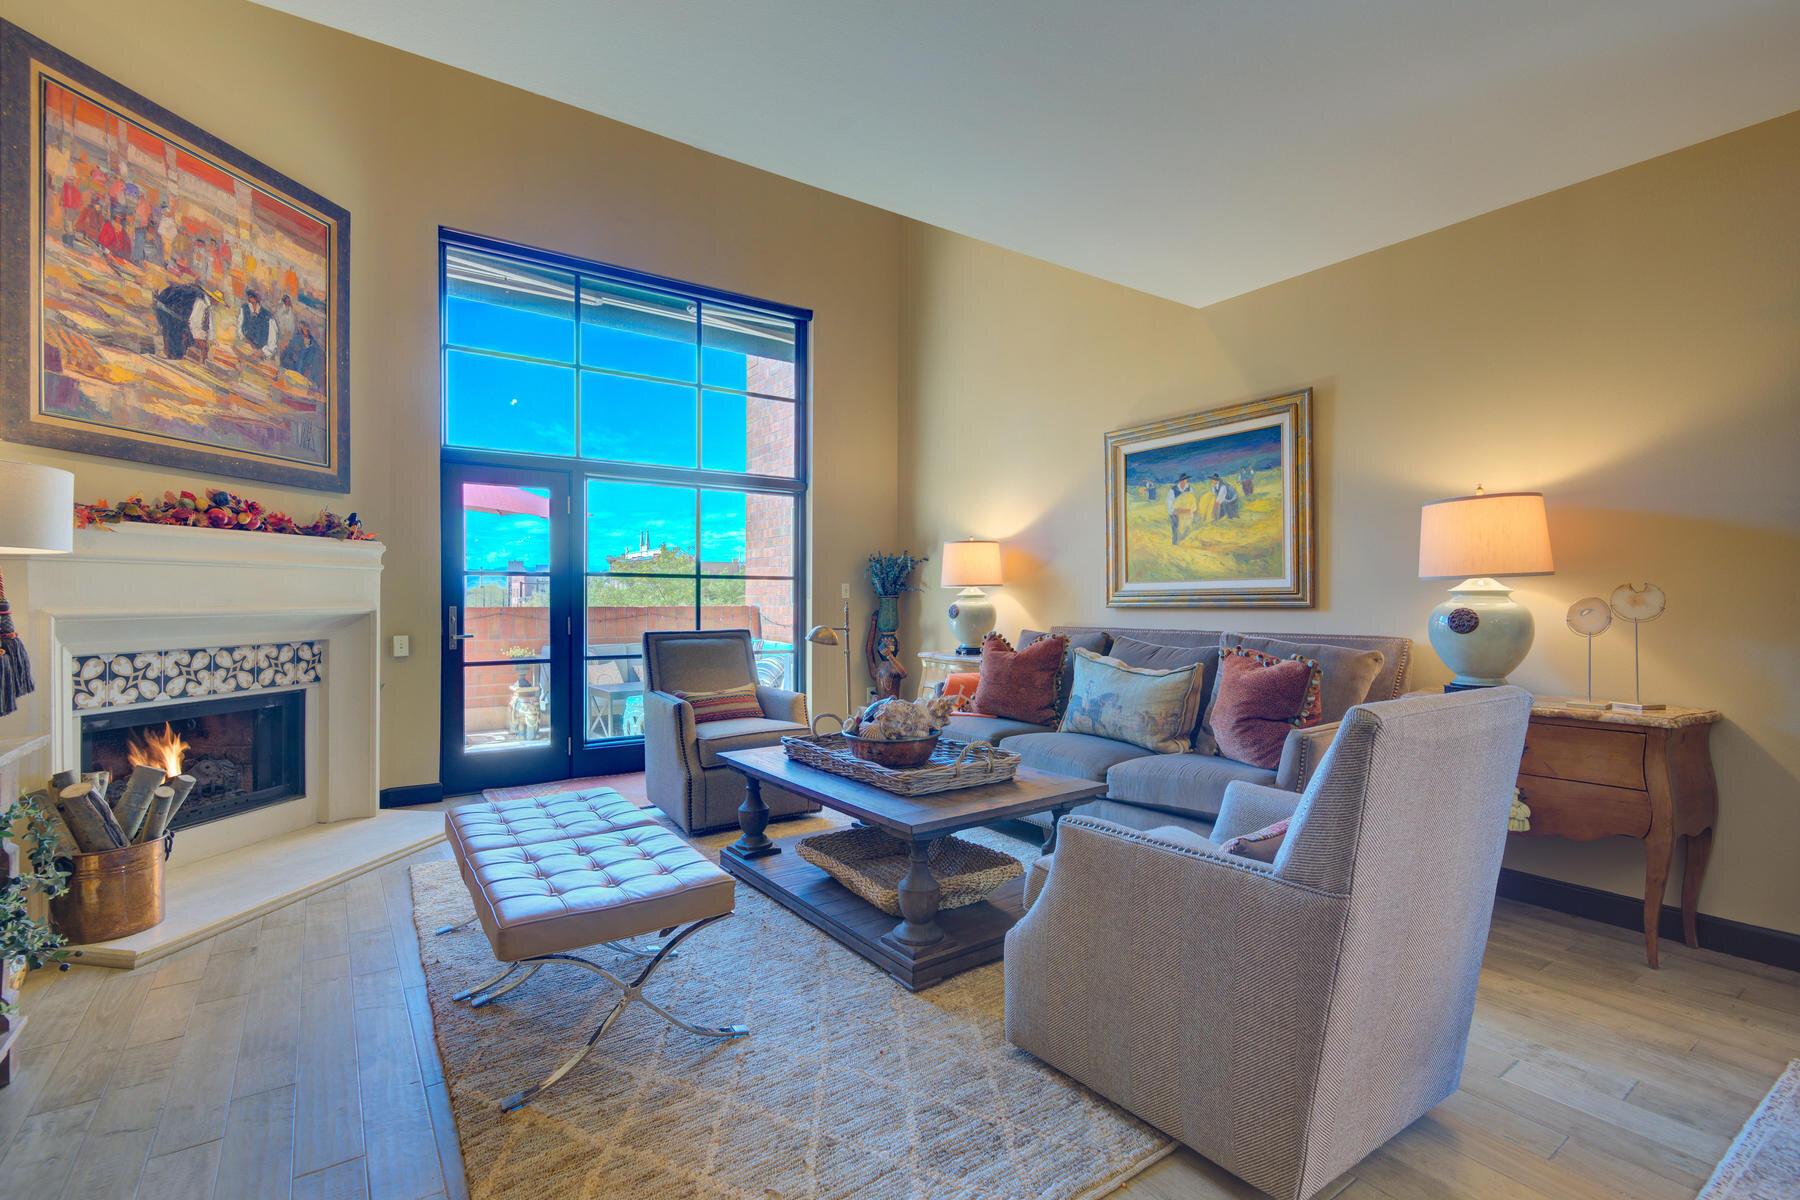 1512 Larimer Street-011-018-Living Room-MLS_Size.jpg